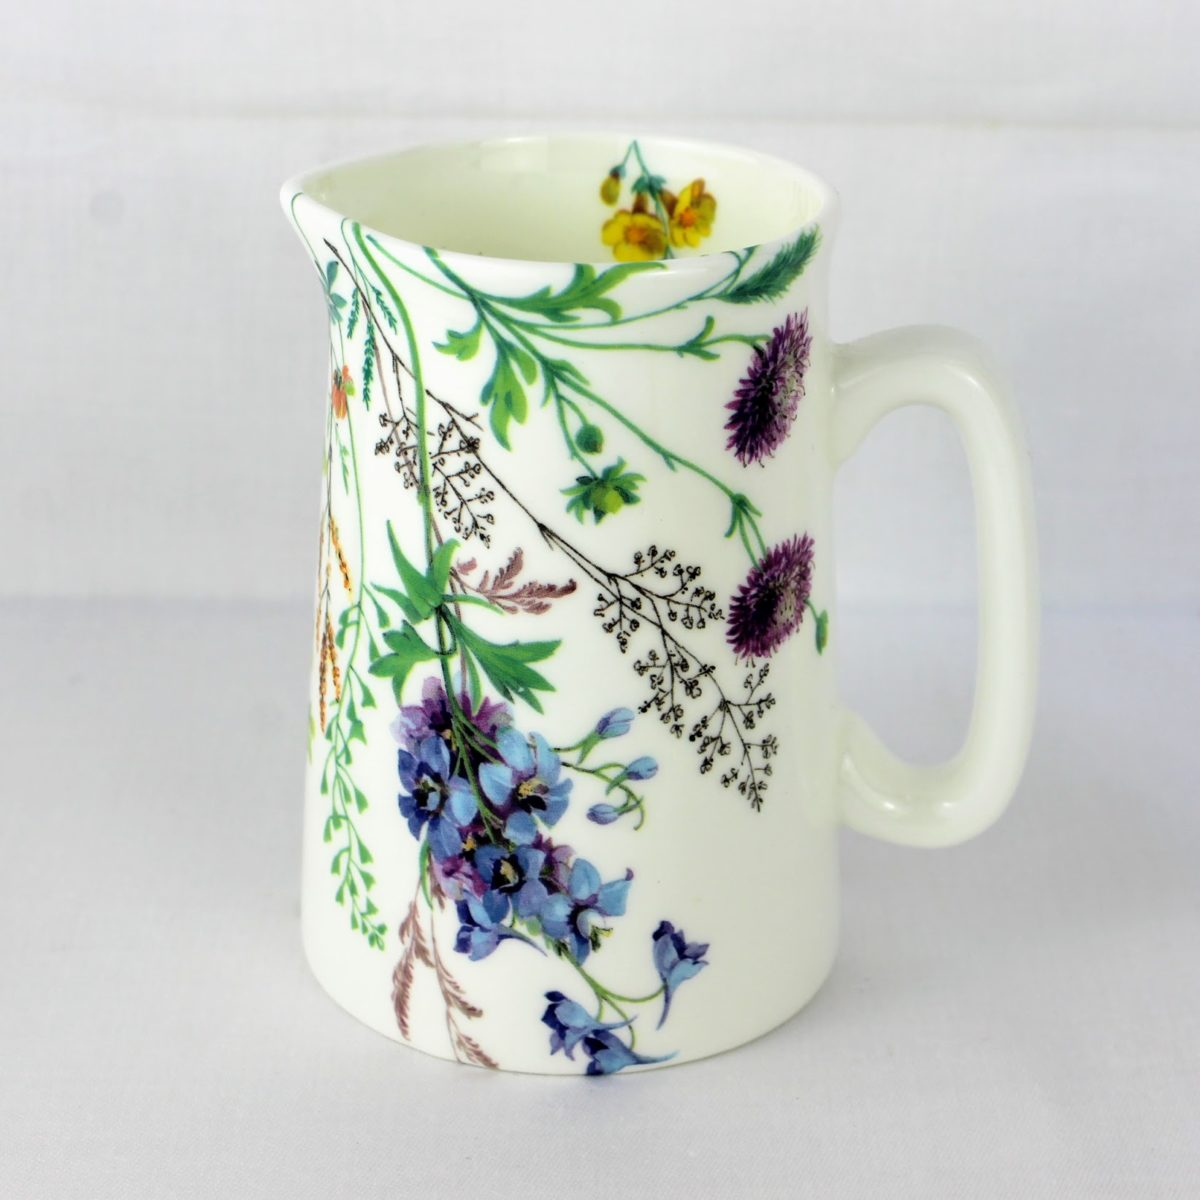 bone china milk jug, meadow flowers, yellow rattle, cornflower, and columbine